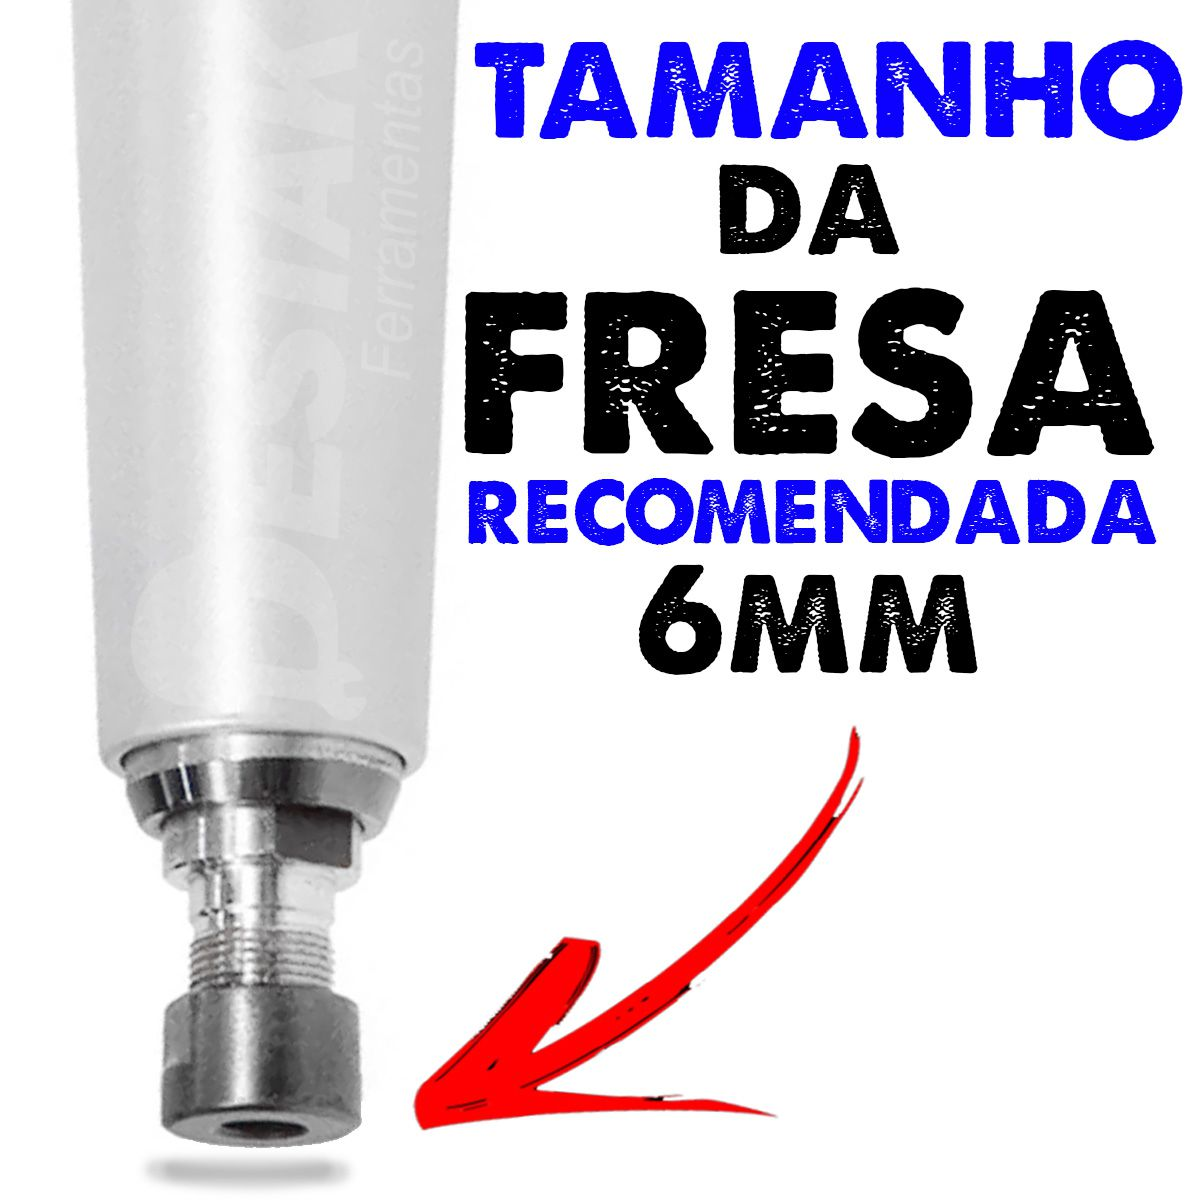 Retífica Reta Lona Retificadeira 670w 220v G1915/br2 - Gamma